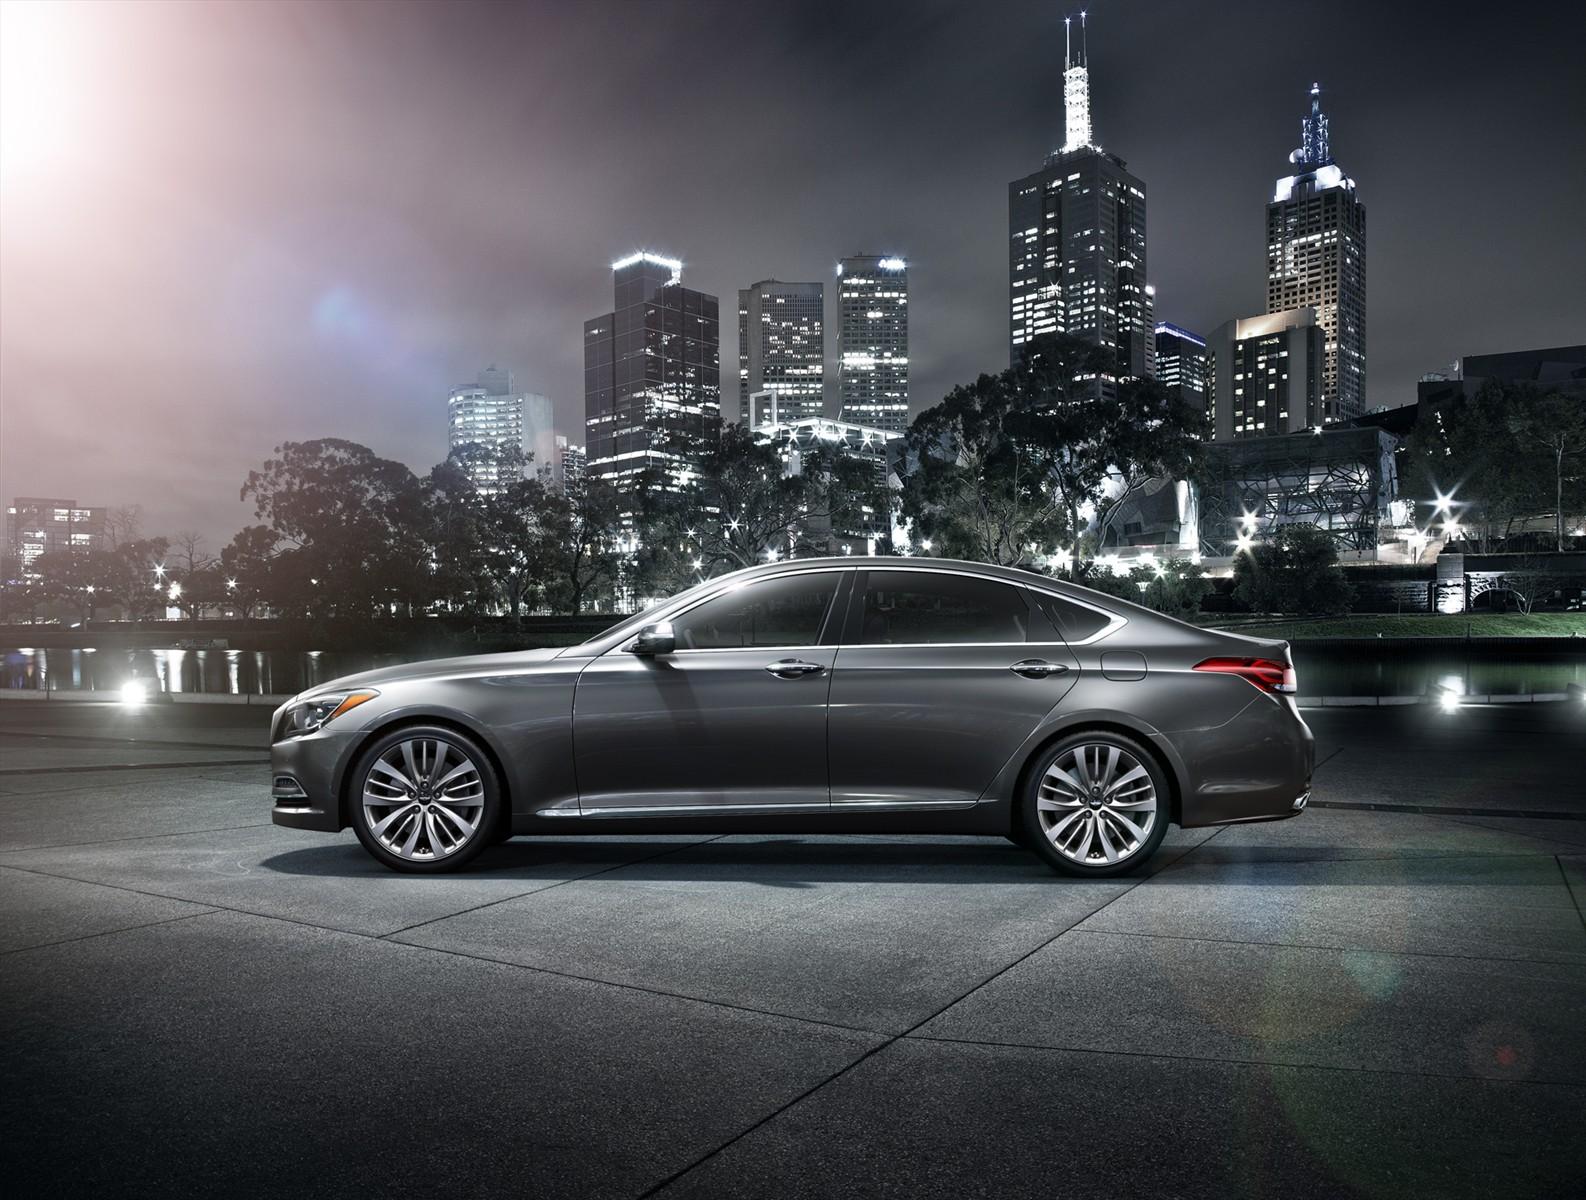 Exclusive: Line-up of Future Hyundai & Kia RWD Premium Models